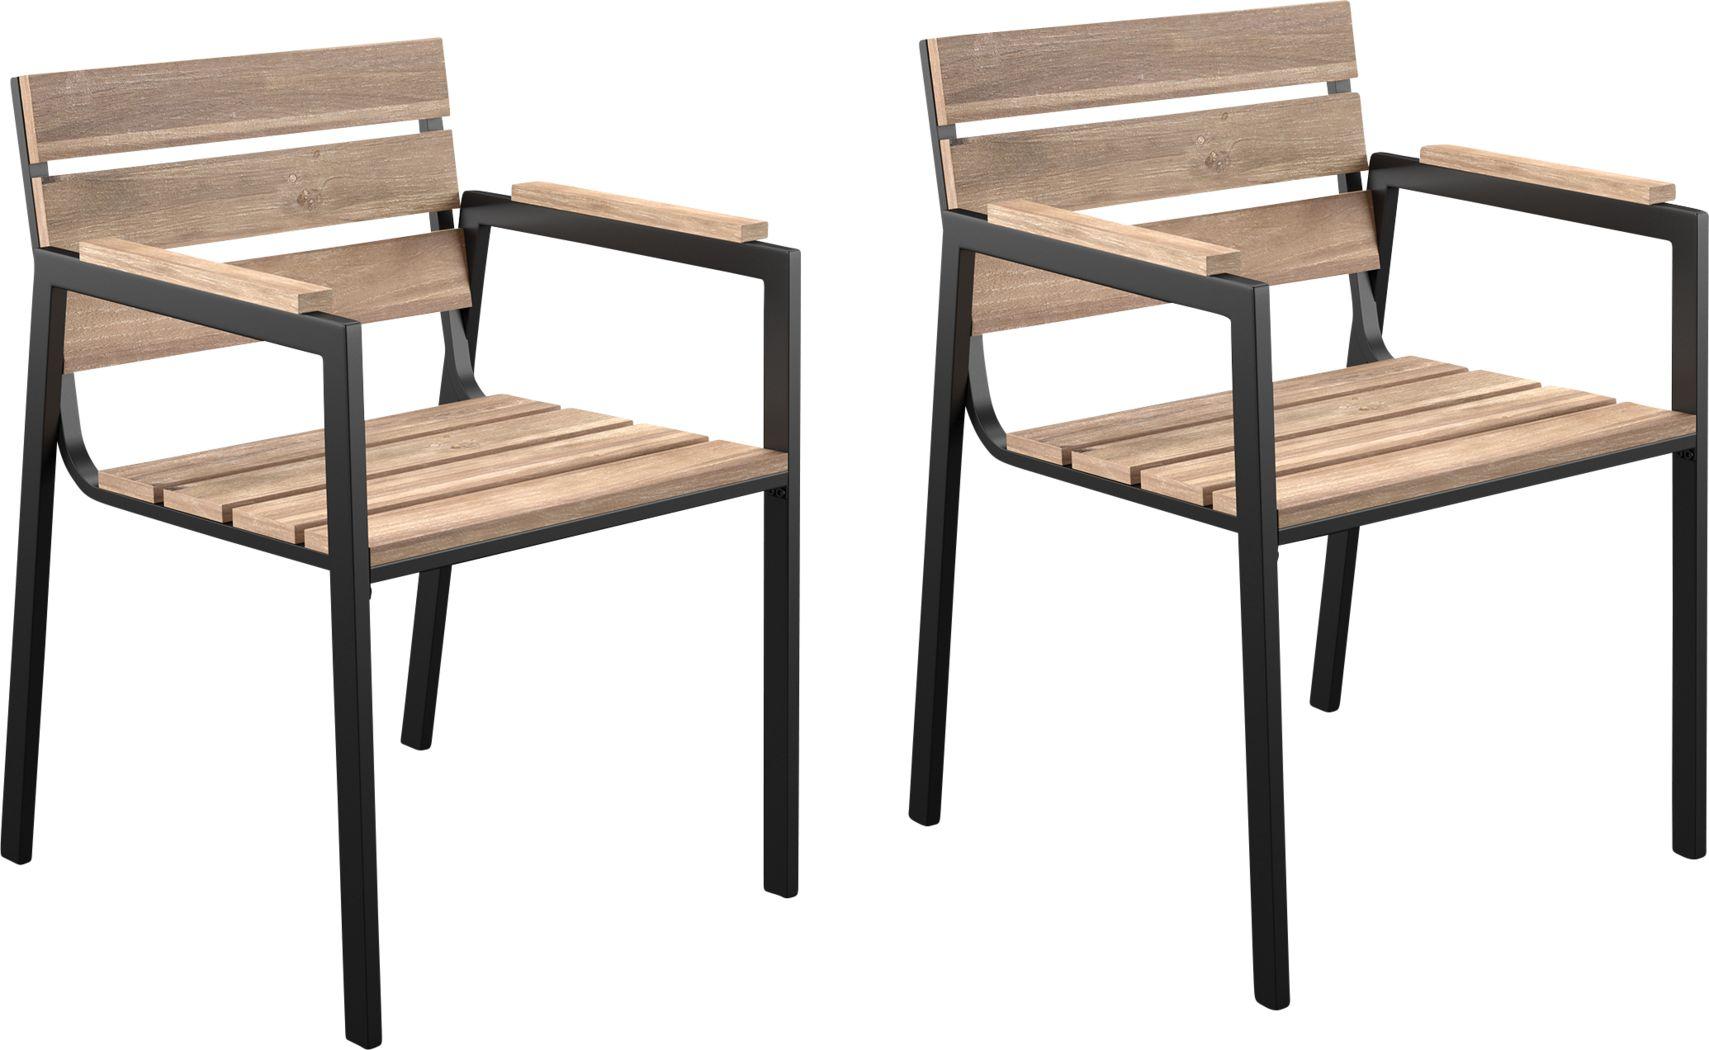 Vermissa Natural Outdoor Arm Chair, Set of 2